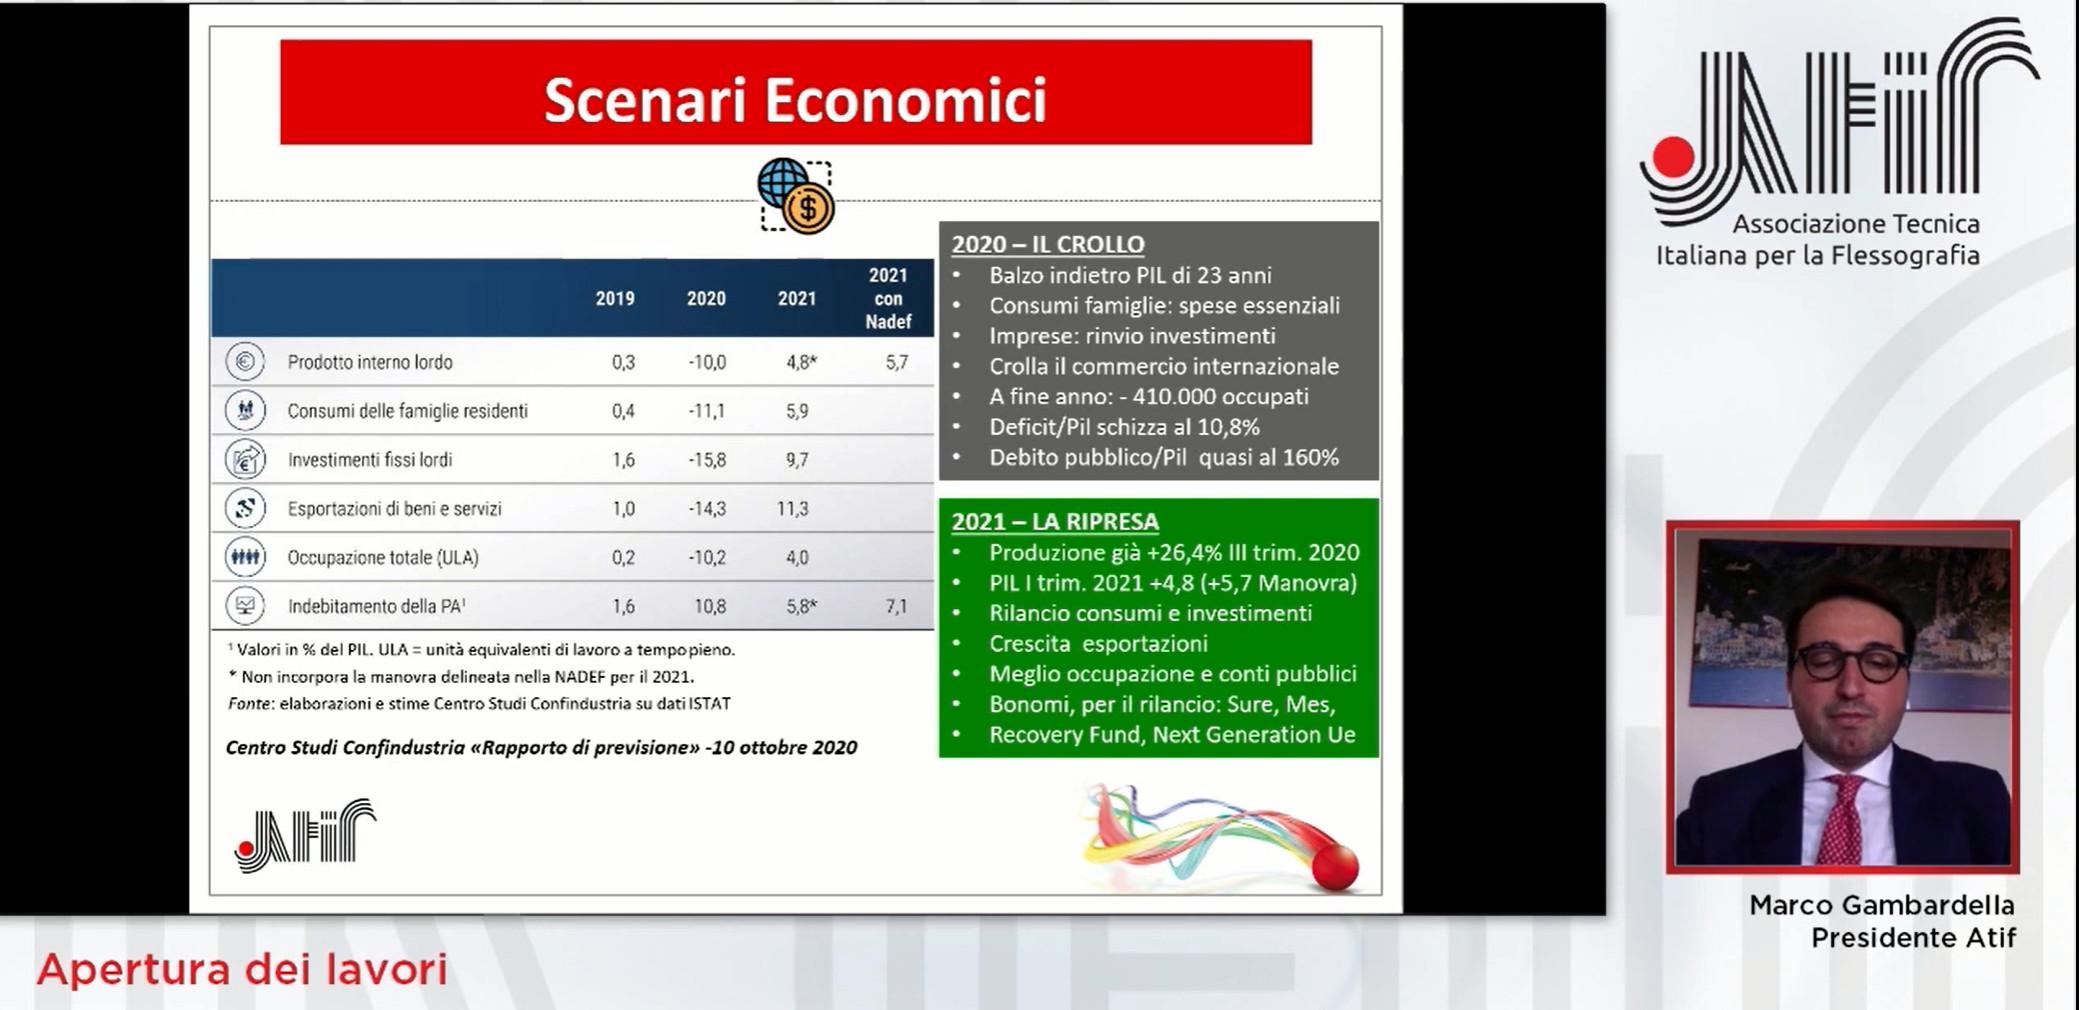 flexo_scenari economici